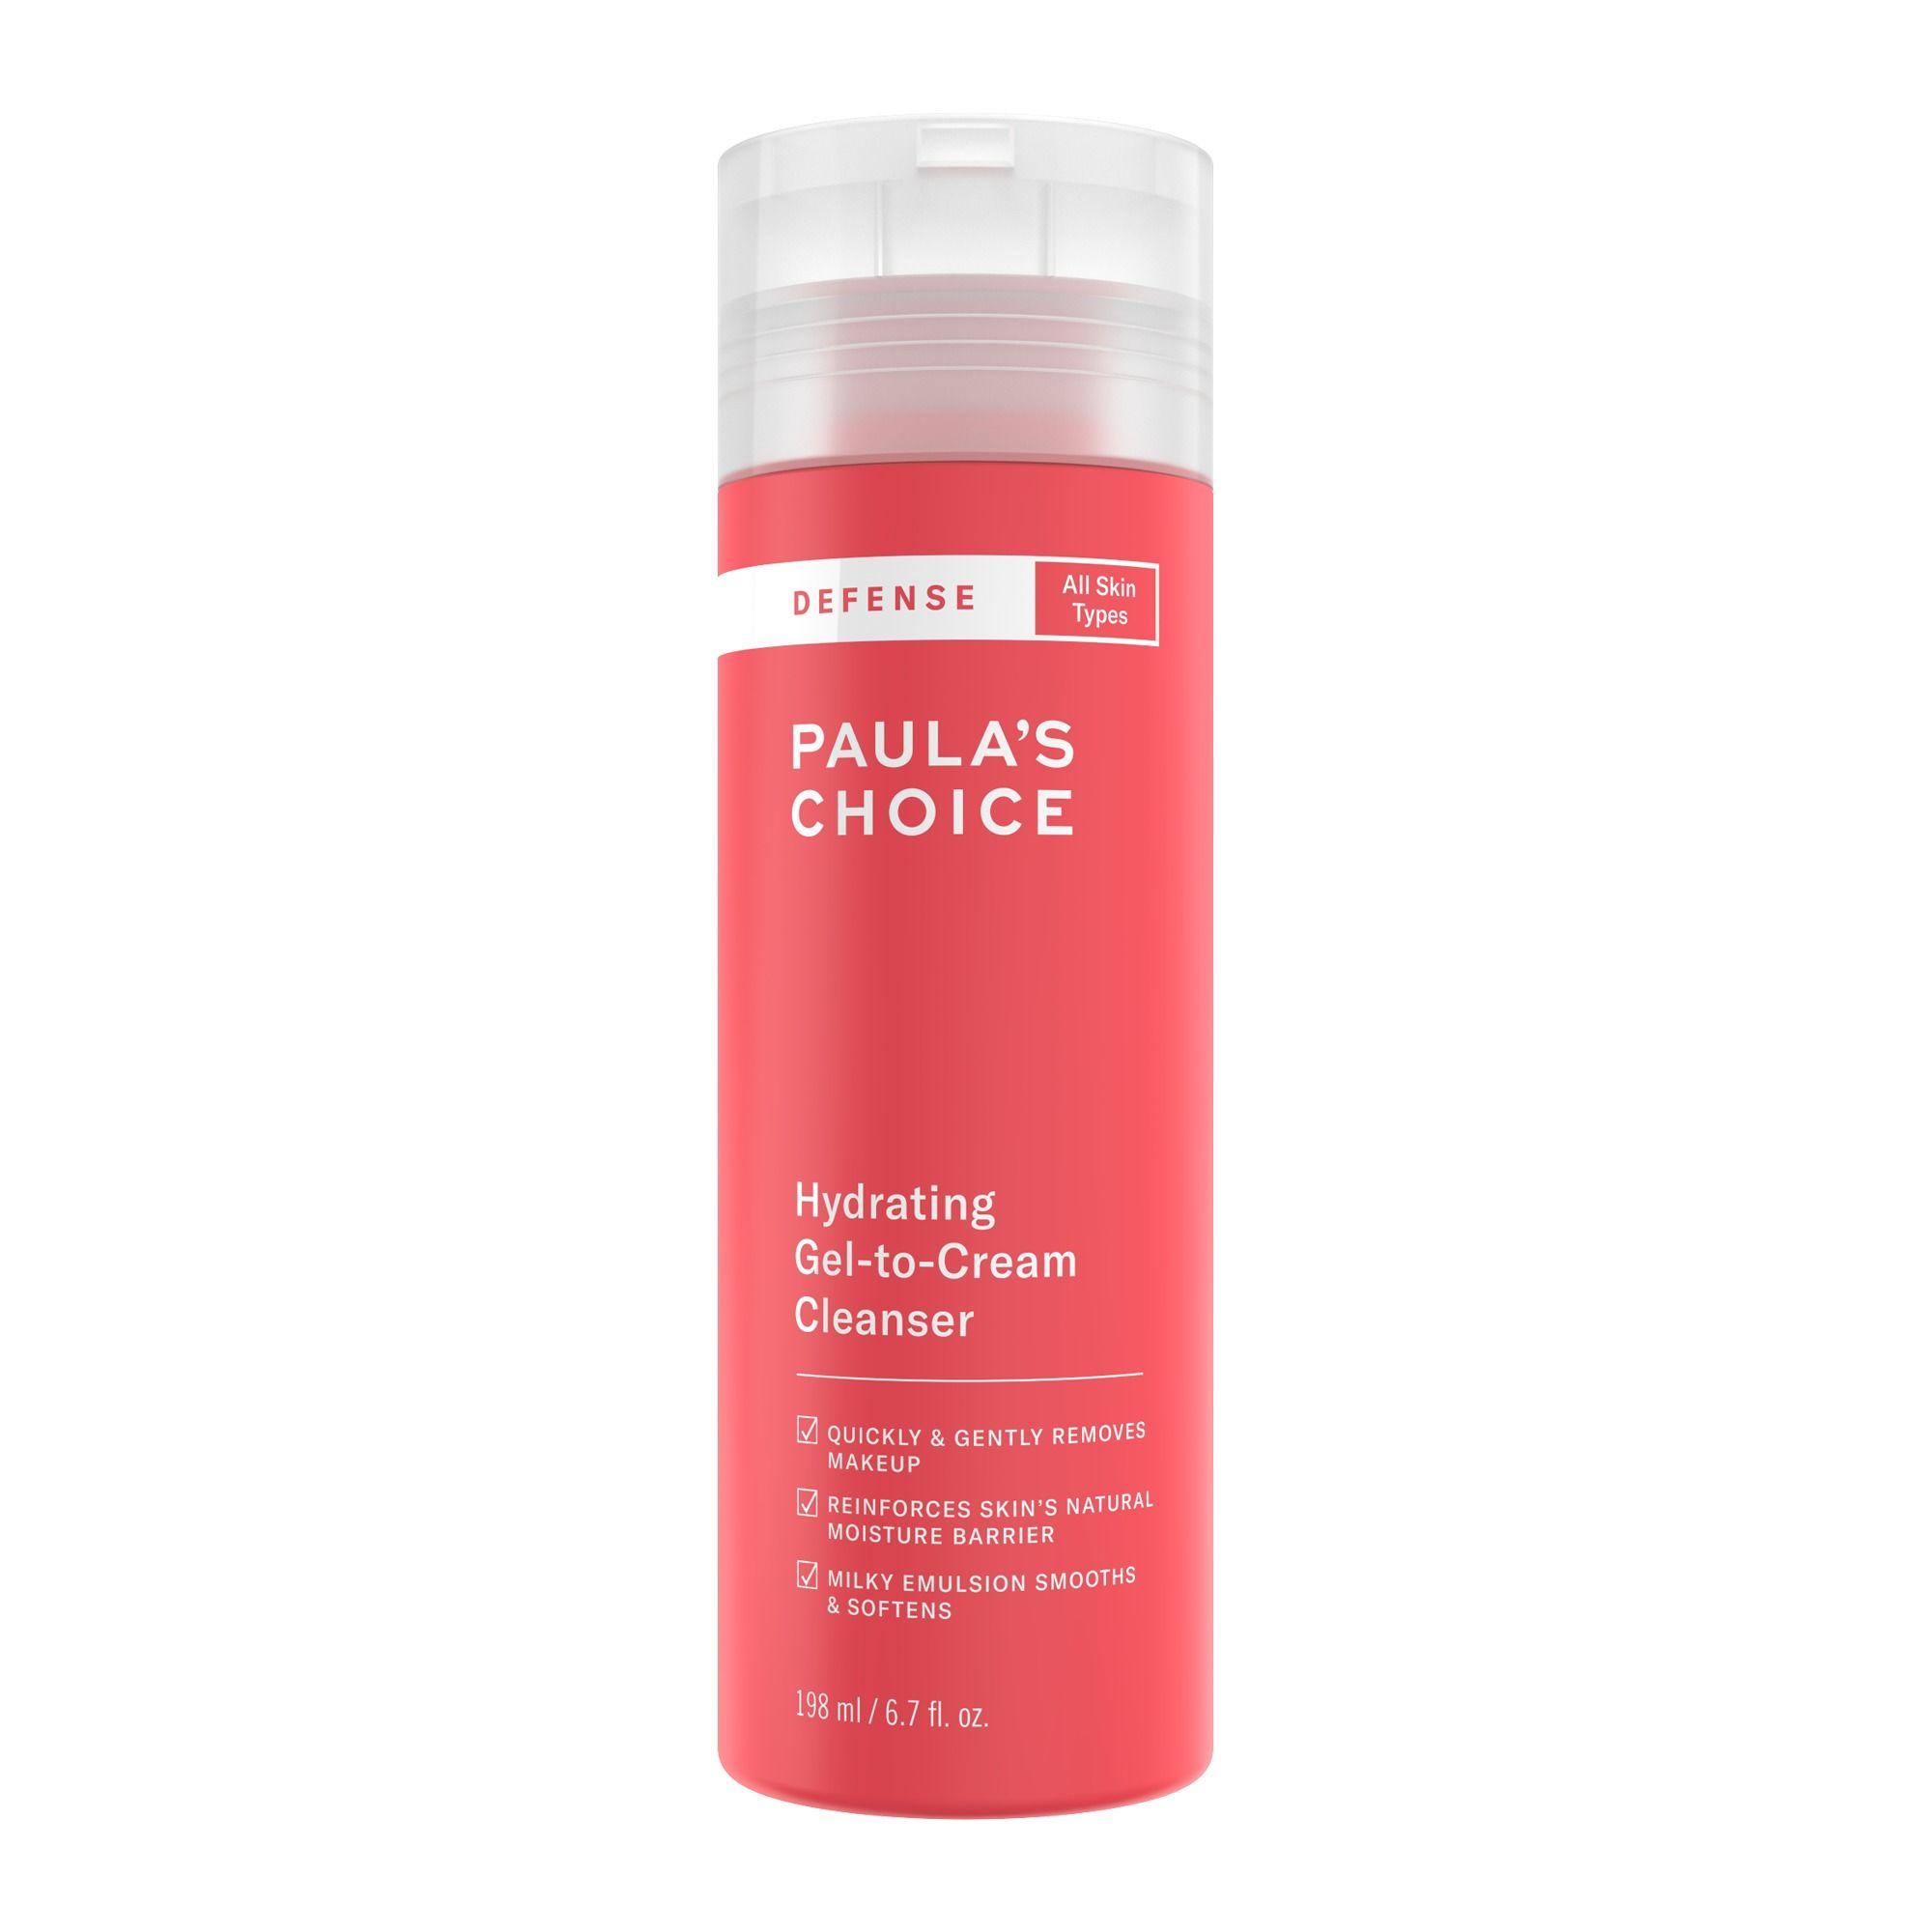 Paula's Choice Defense Hydrating Gel-To-Cream Cleanser